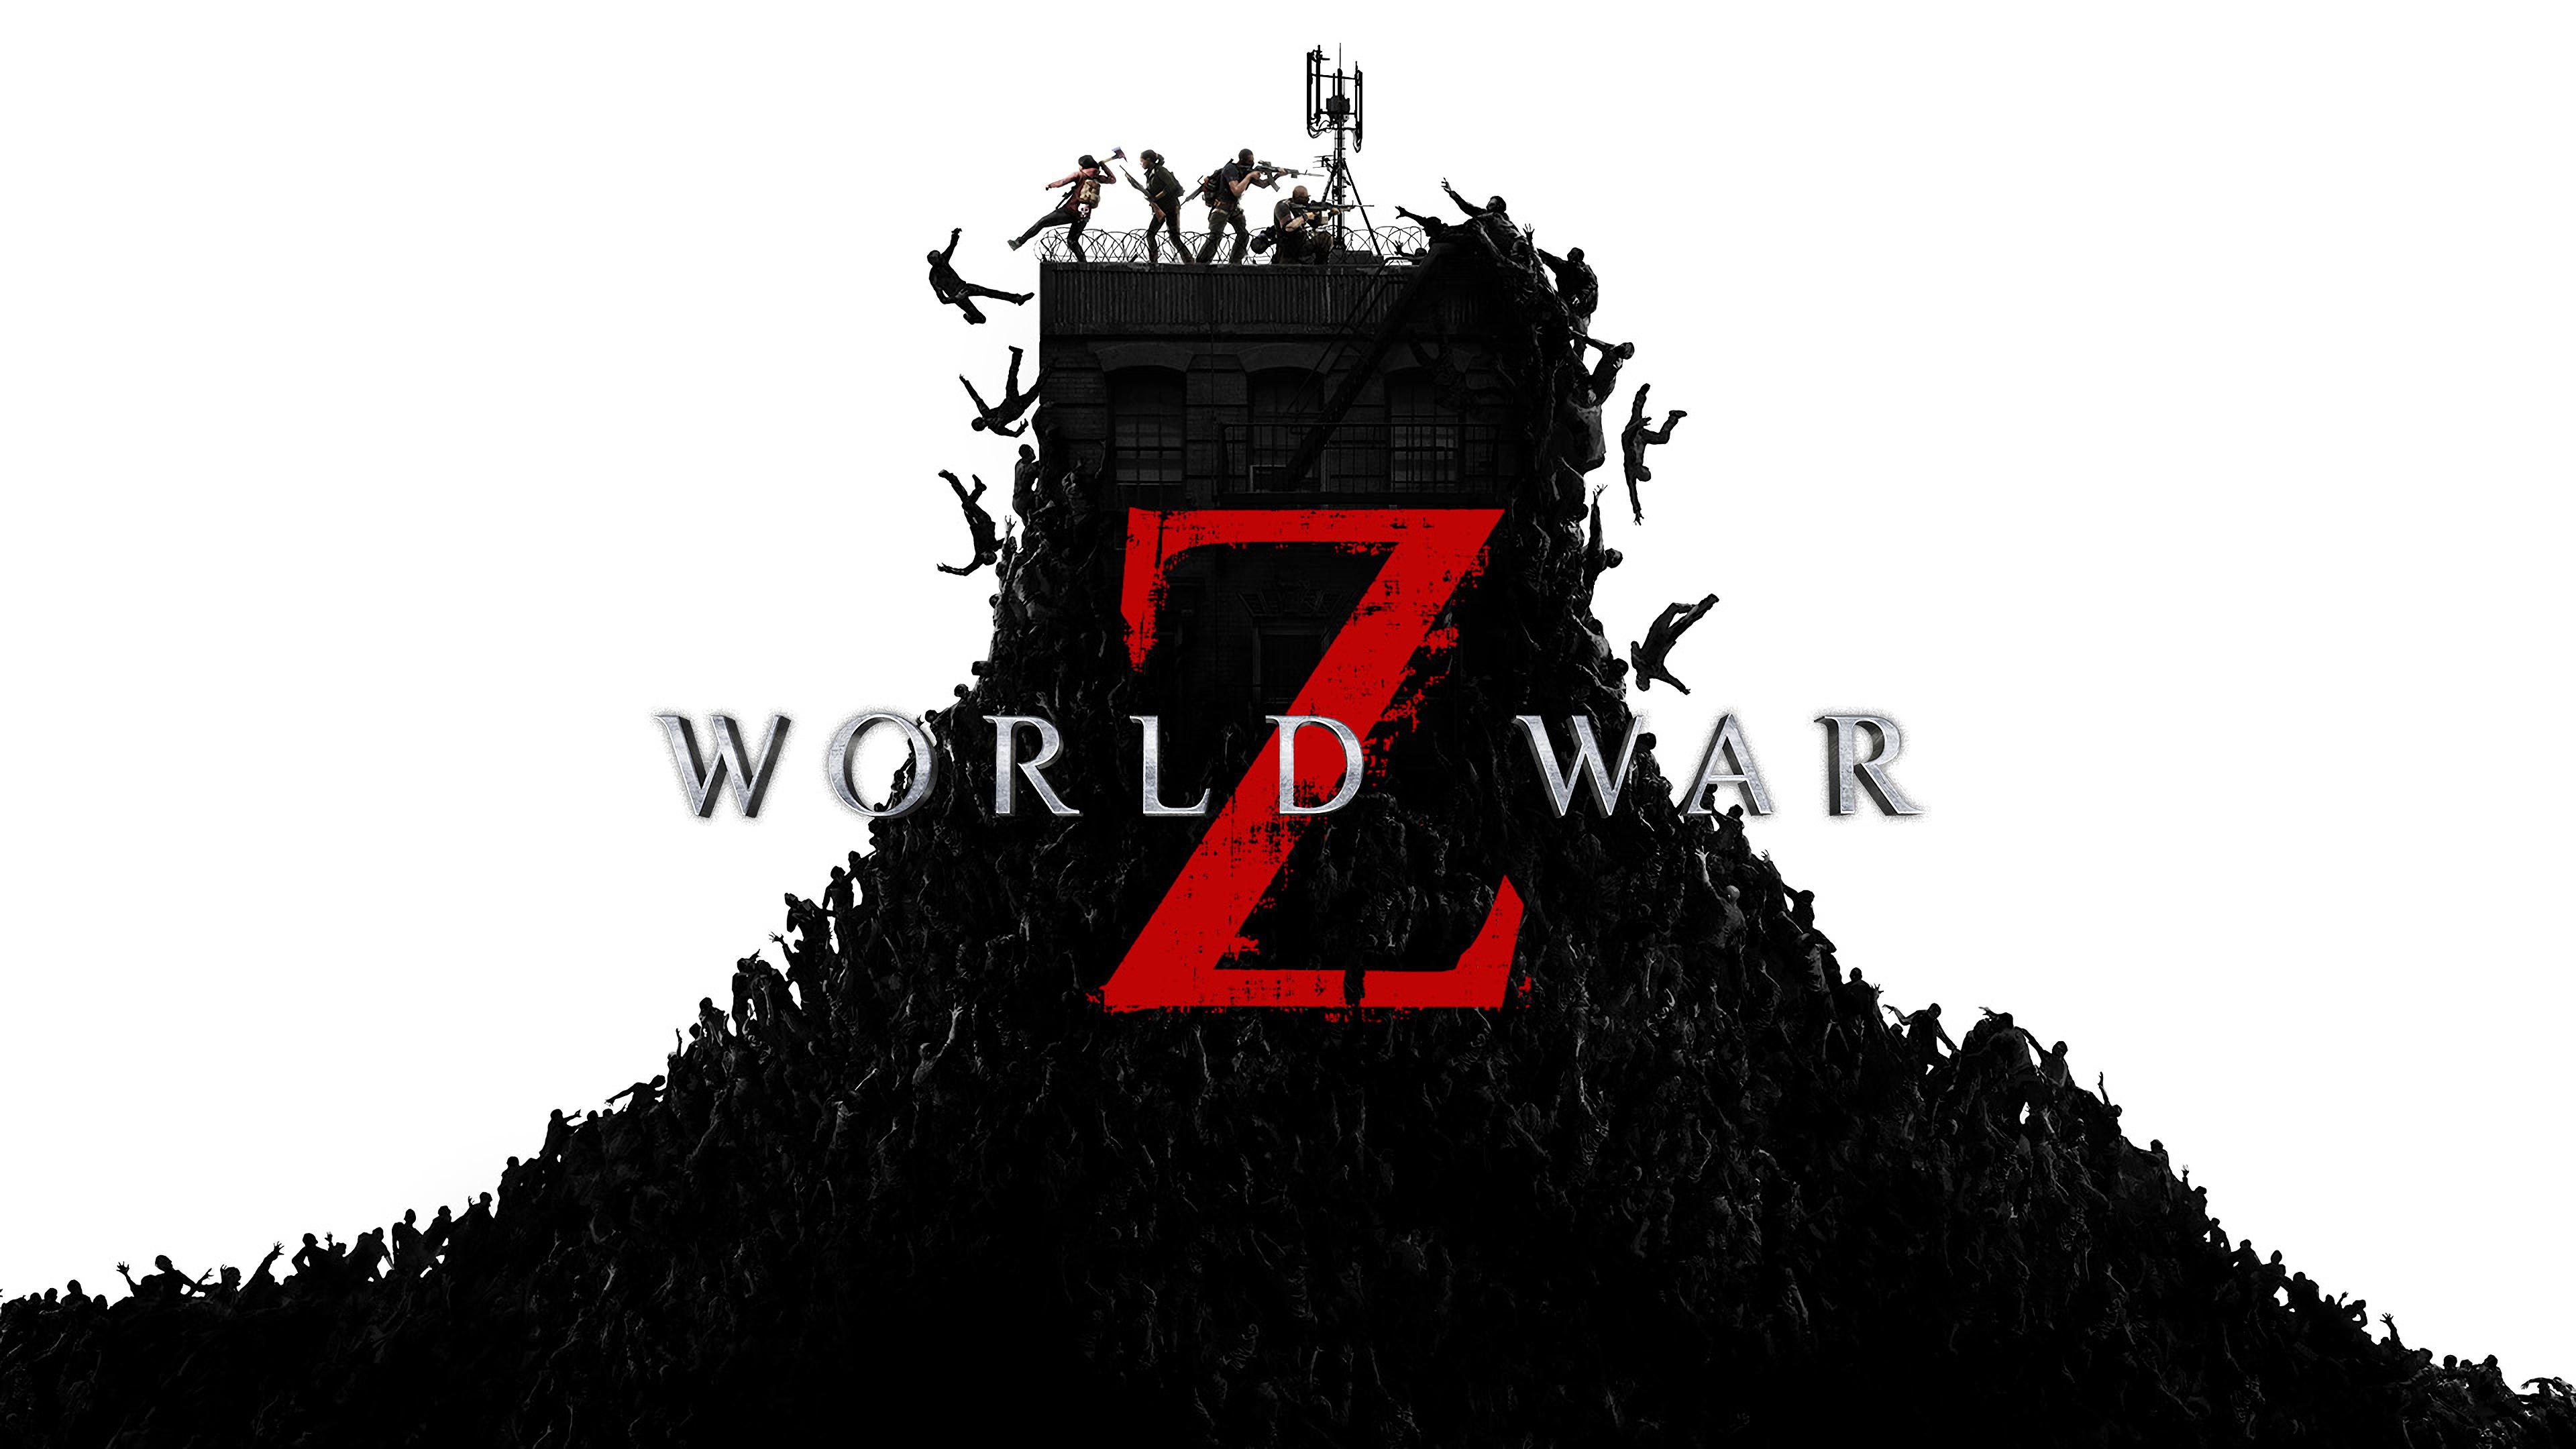 320697 World War Z Game Zombies 4K wallpaper Mocah HD Wallpapers 3840x2160